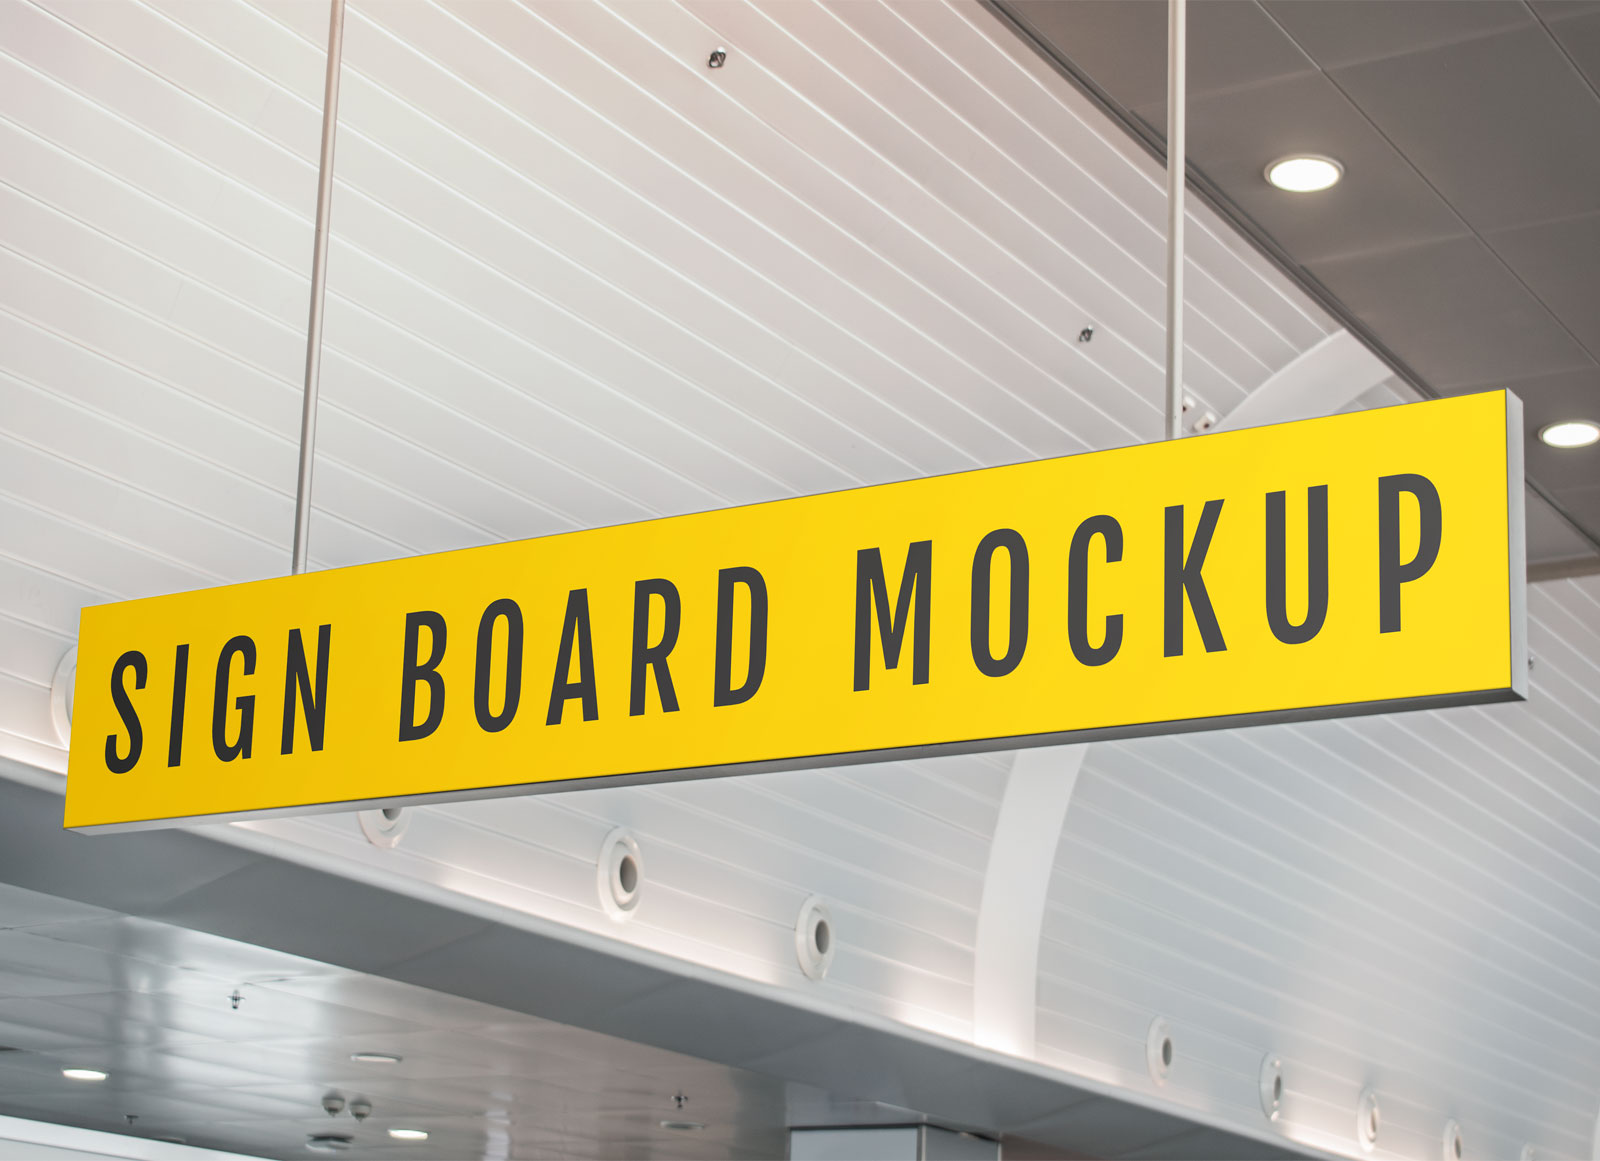 Free-Drop-Down-Sign-Board-Mockup-PSD